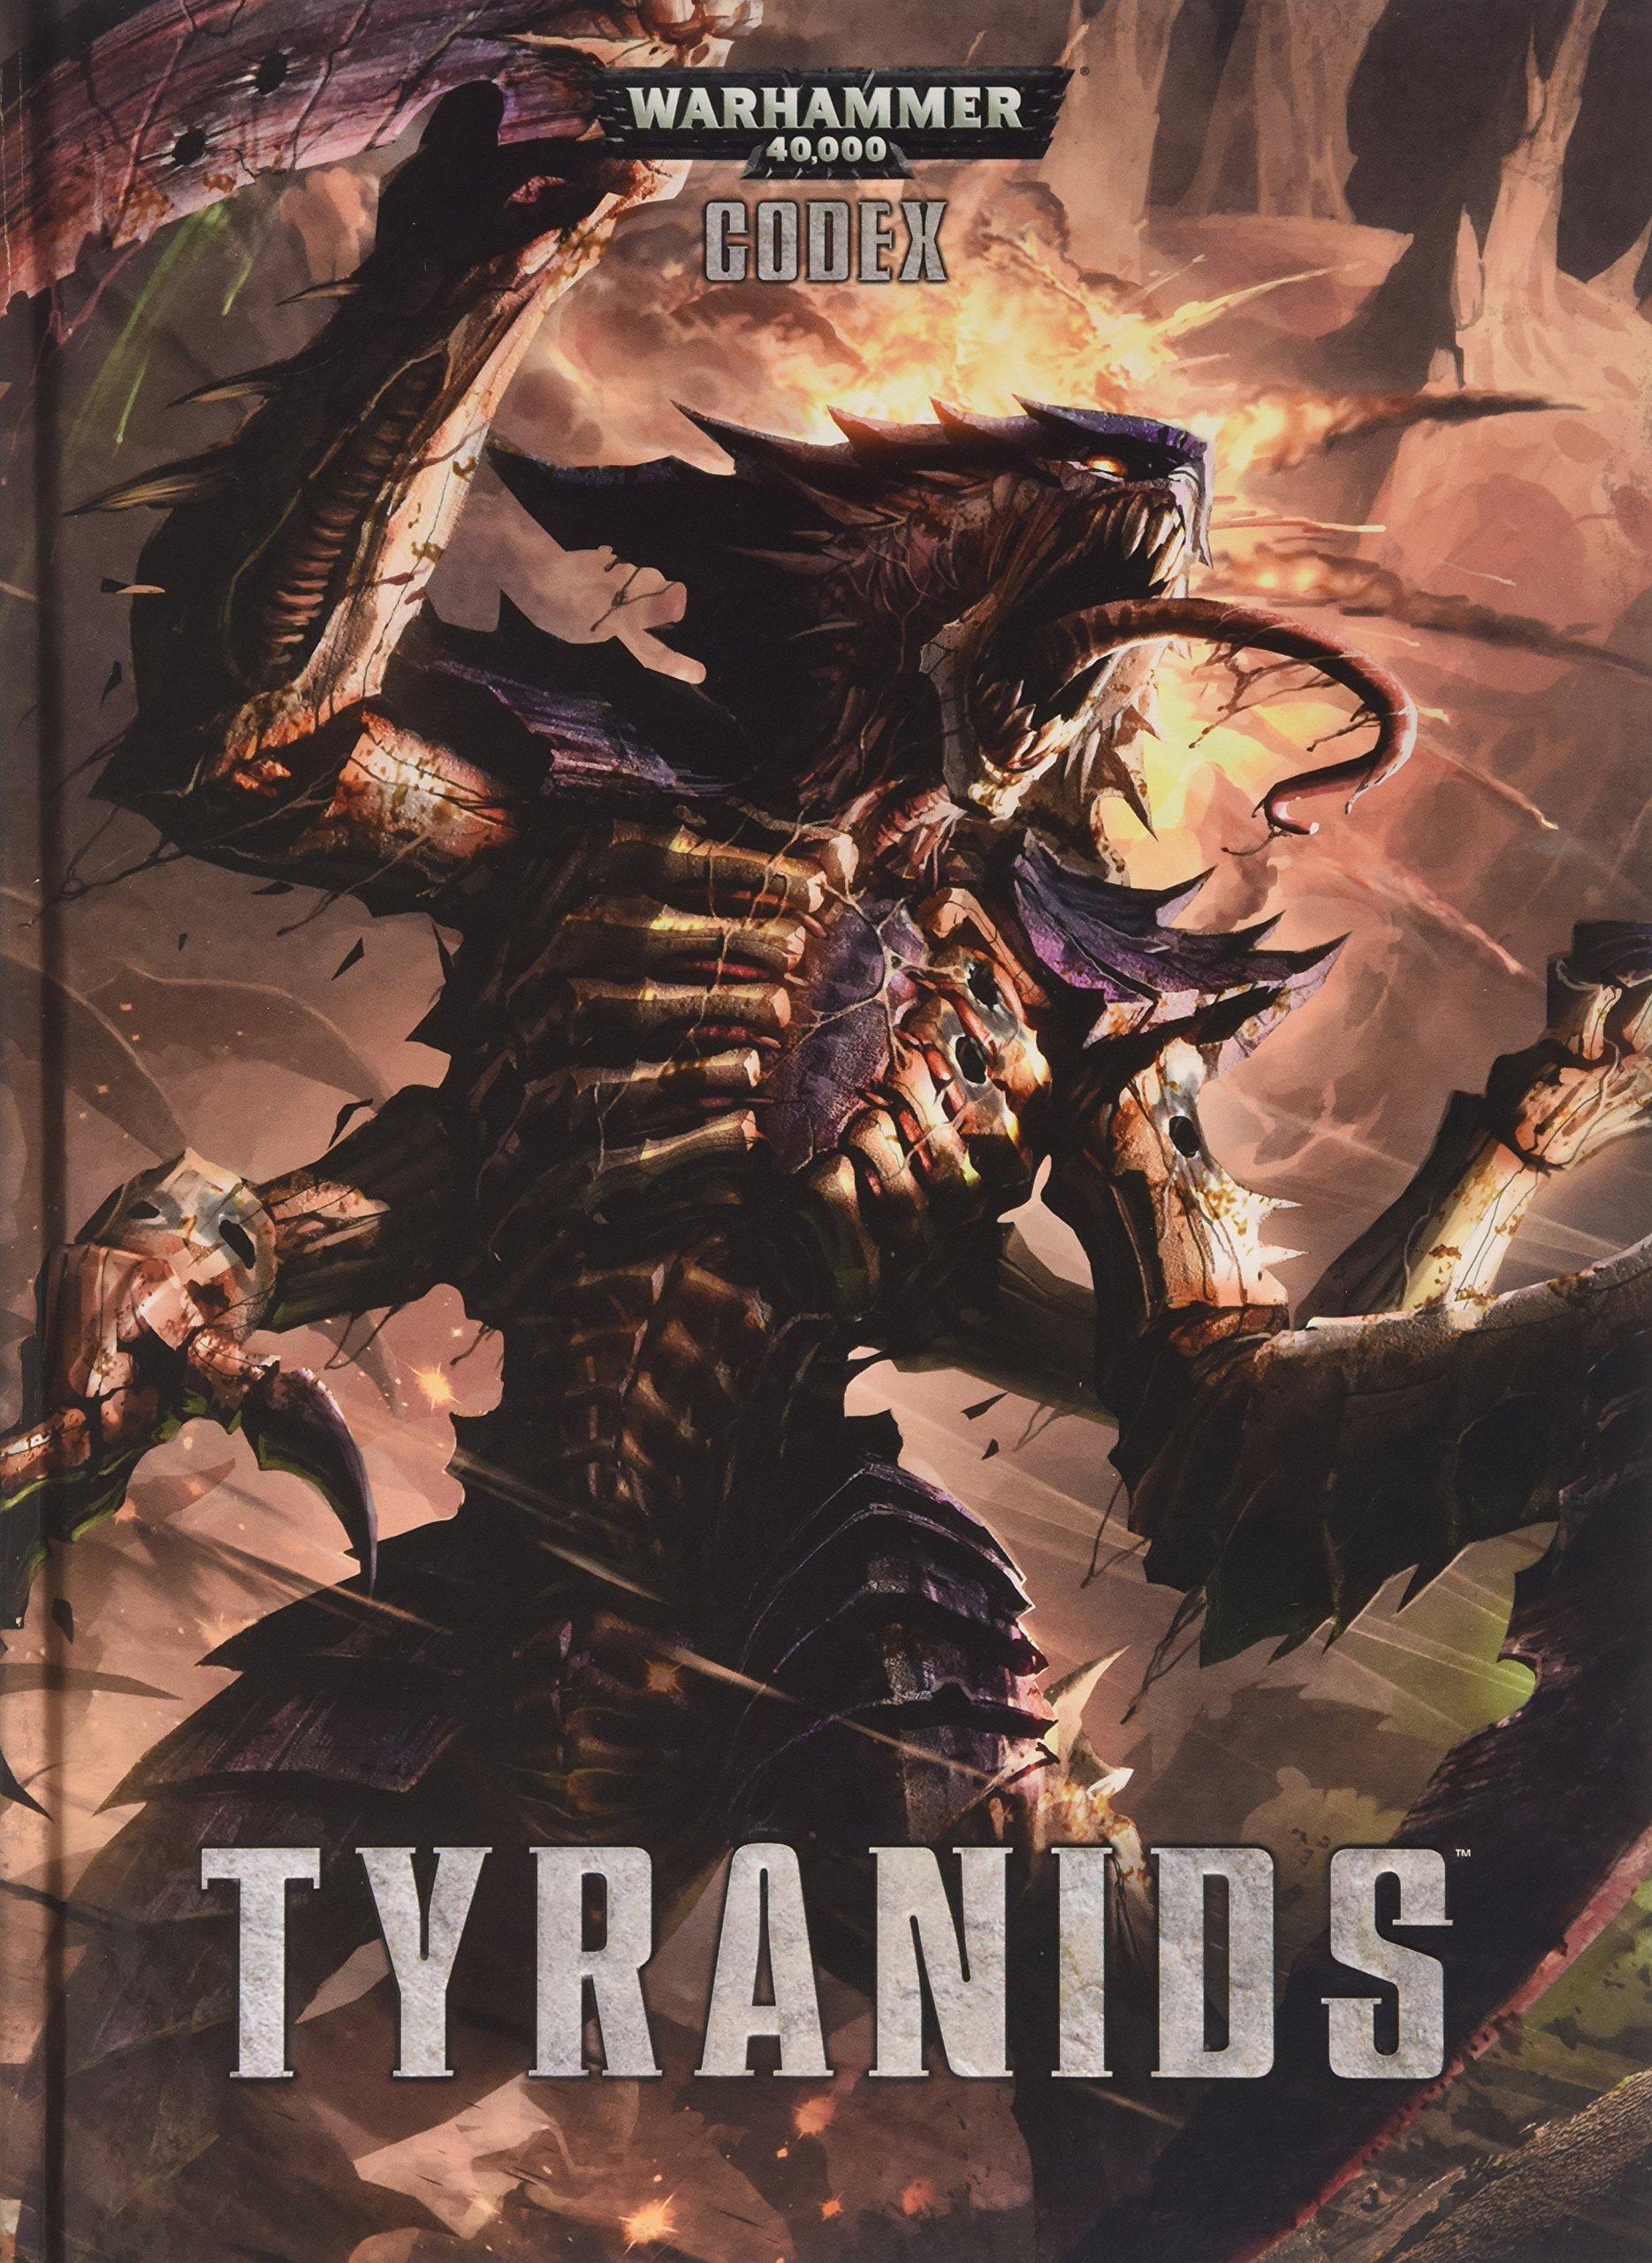 Codex tyranids english amazon games workshop codex tyranids english amazon games workshop 9781782531951 books fandeluxe Gallery